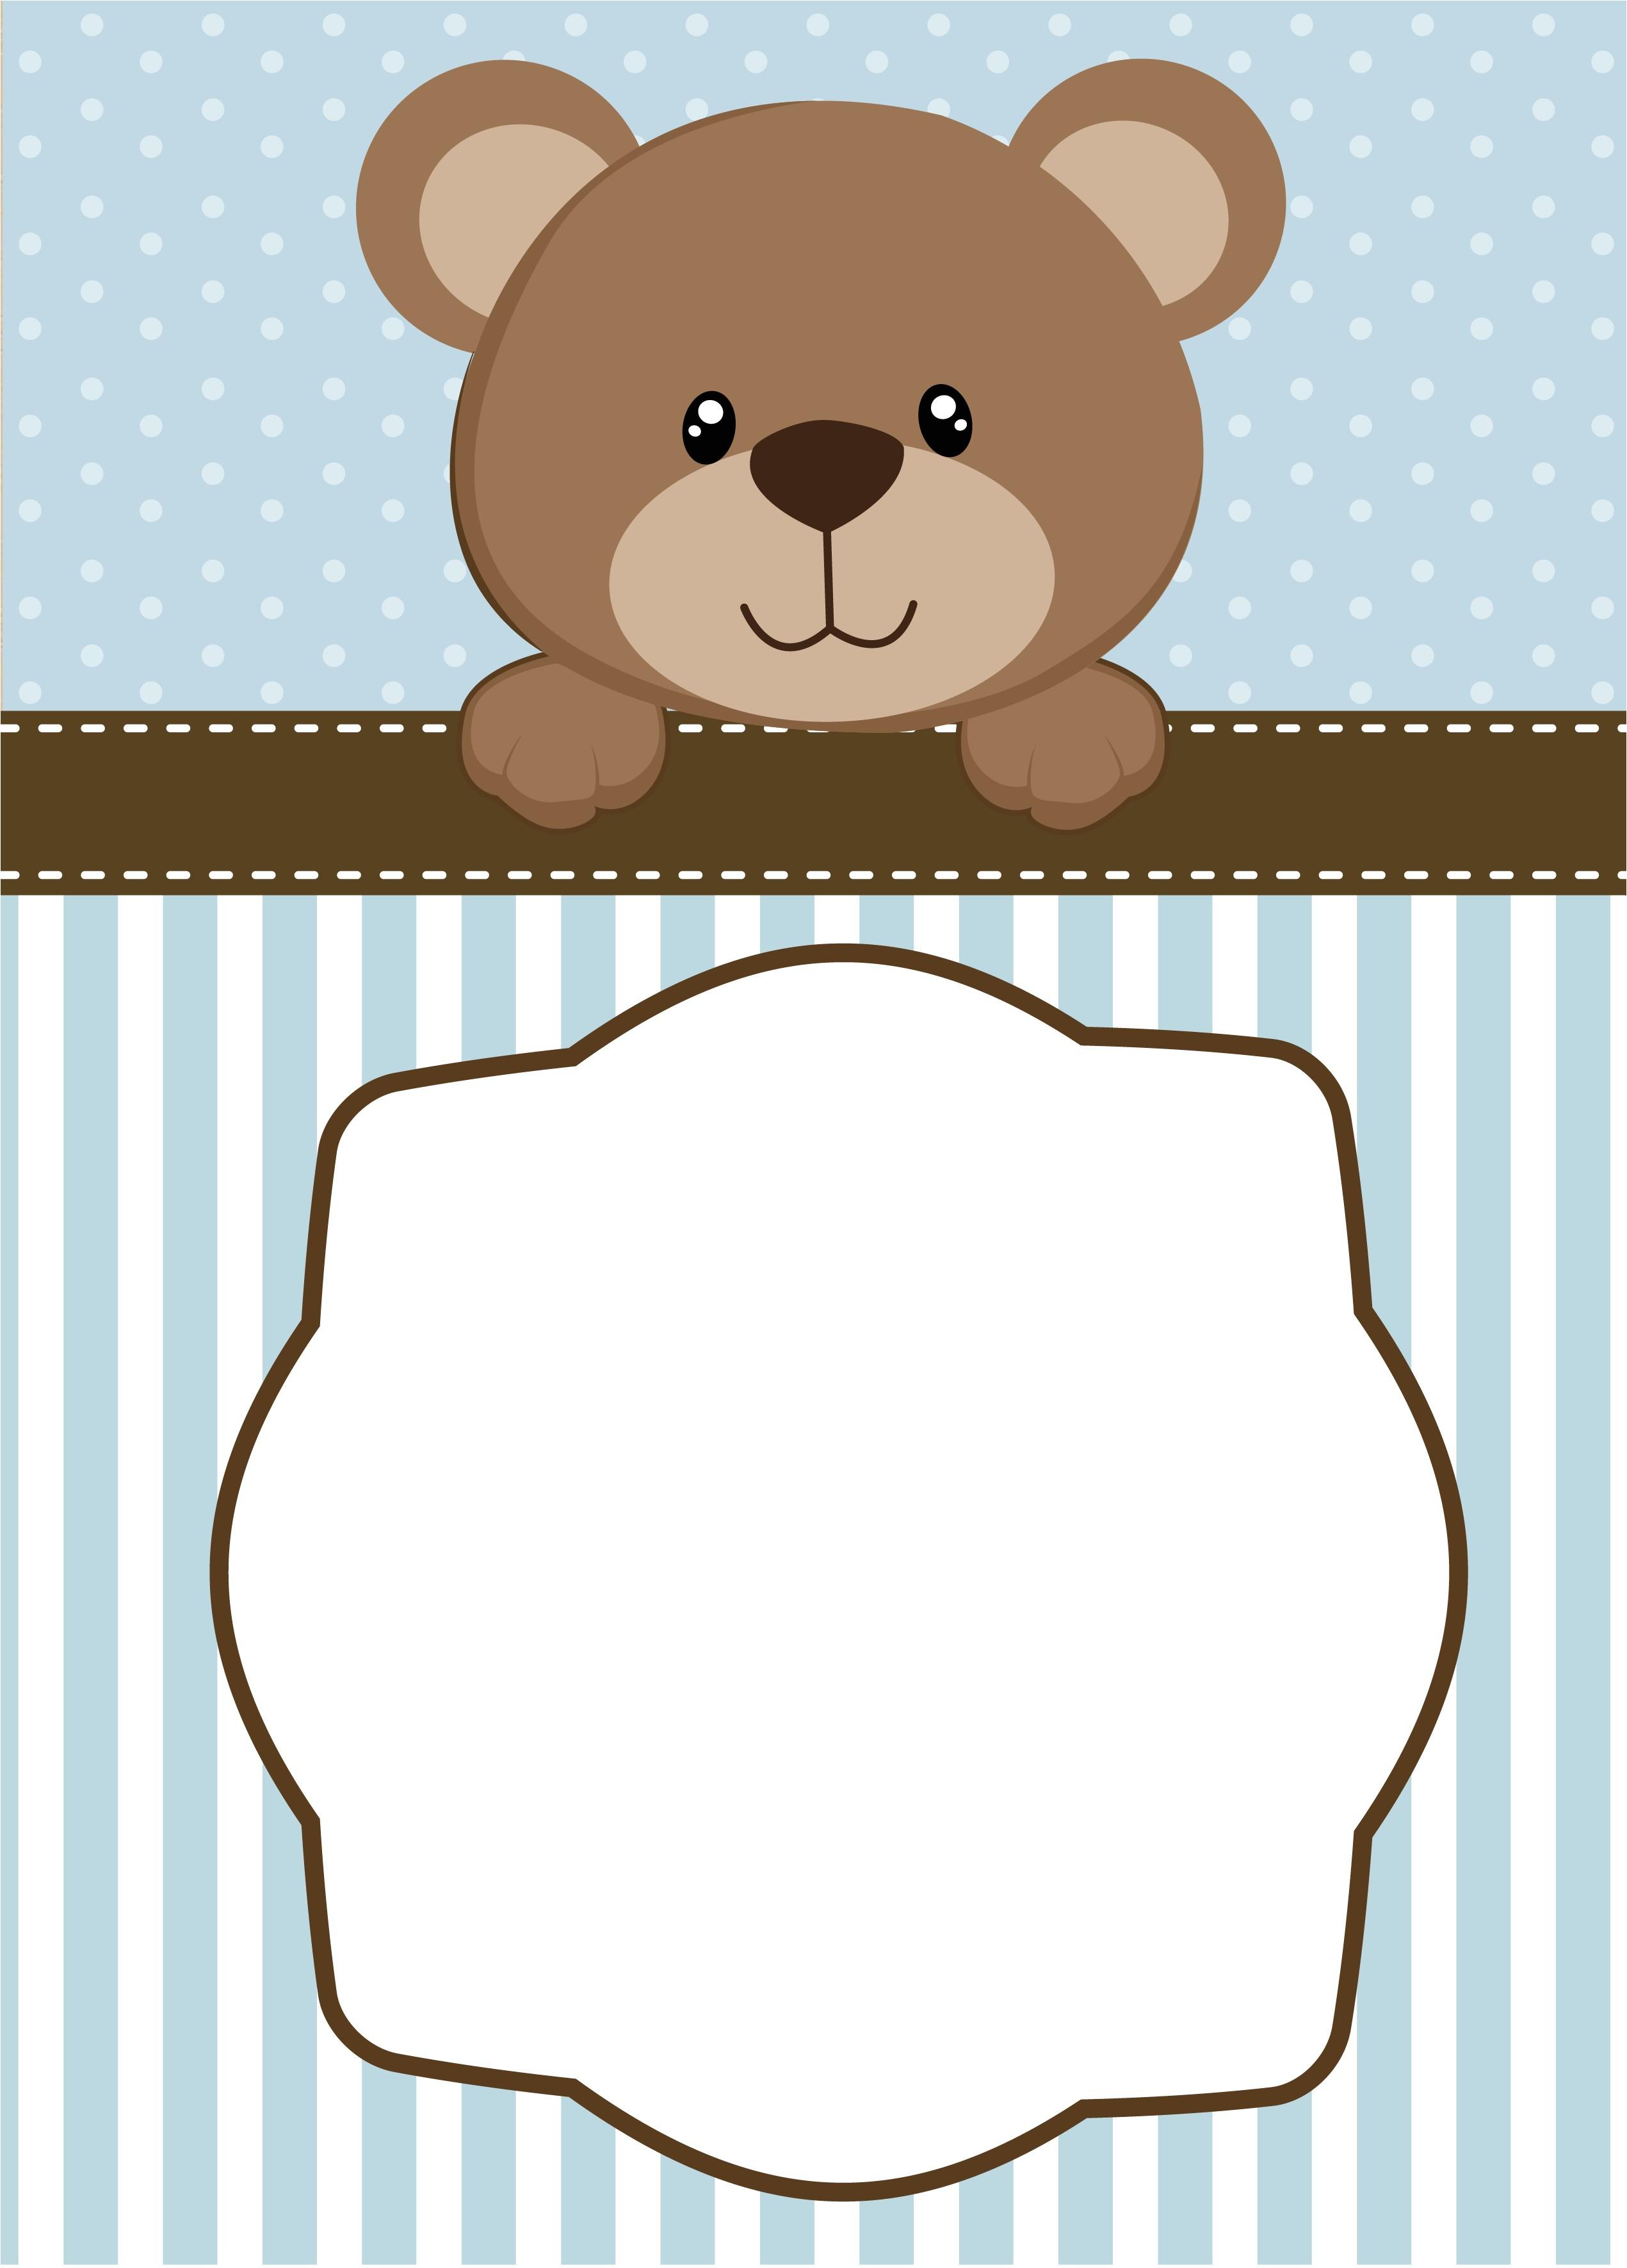 Printable Teddy Bear Baby Shower Invitations Create Teddy Bear Baby Shower Invitations Printable